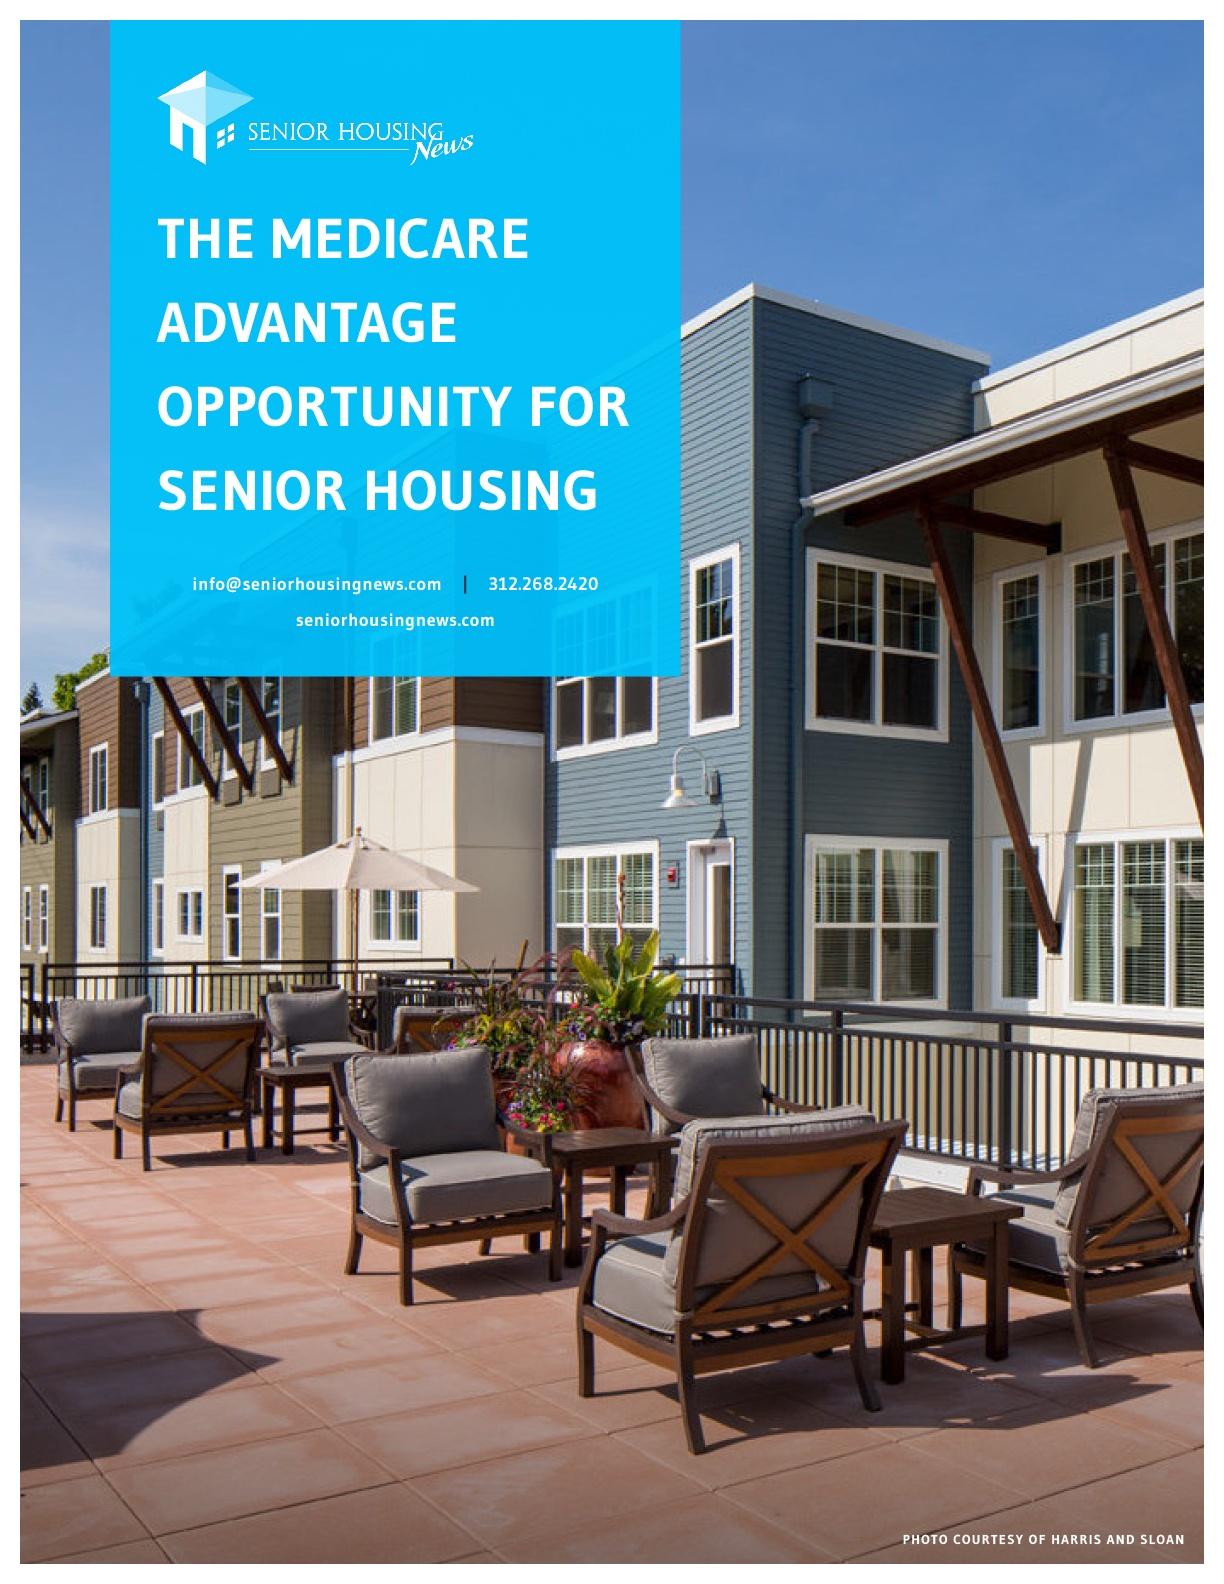 The Medicare Advantage Opportunity for Senior Housing